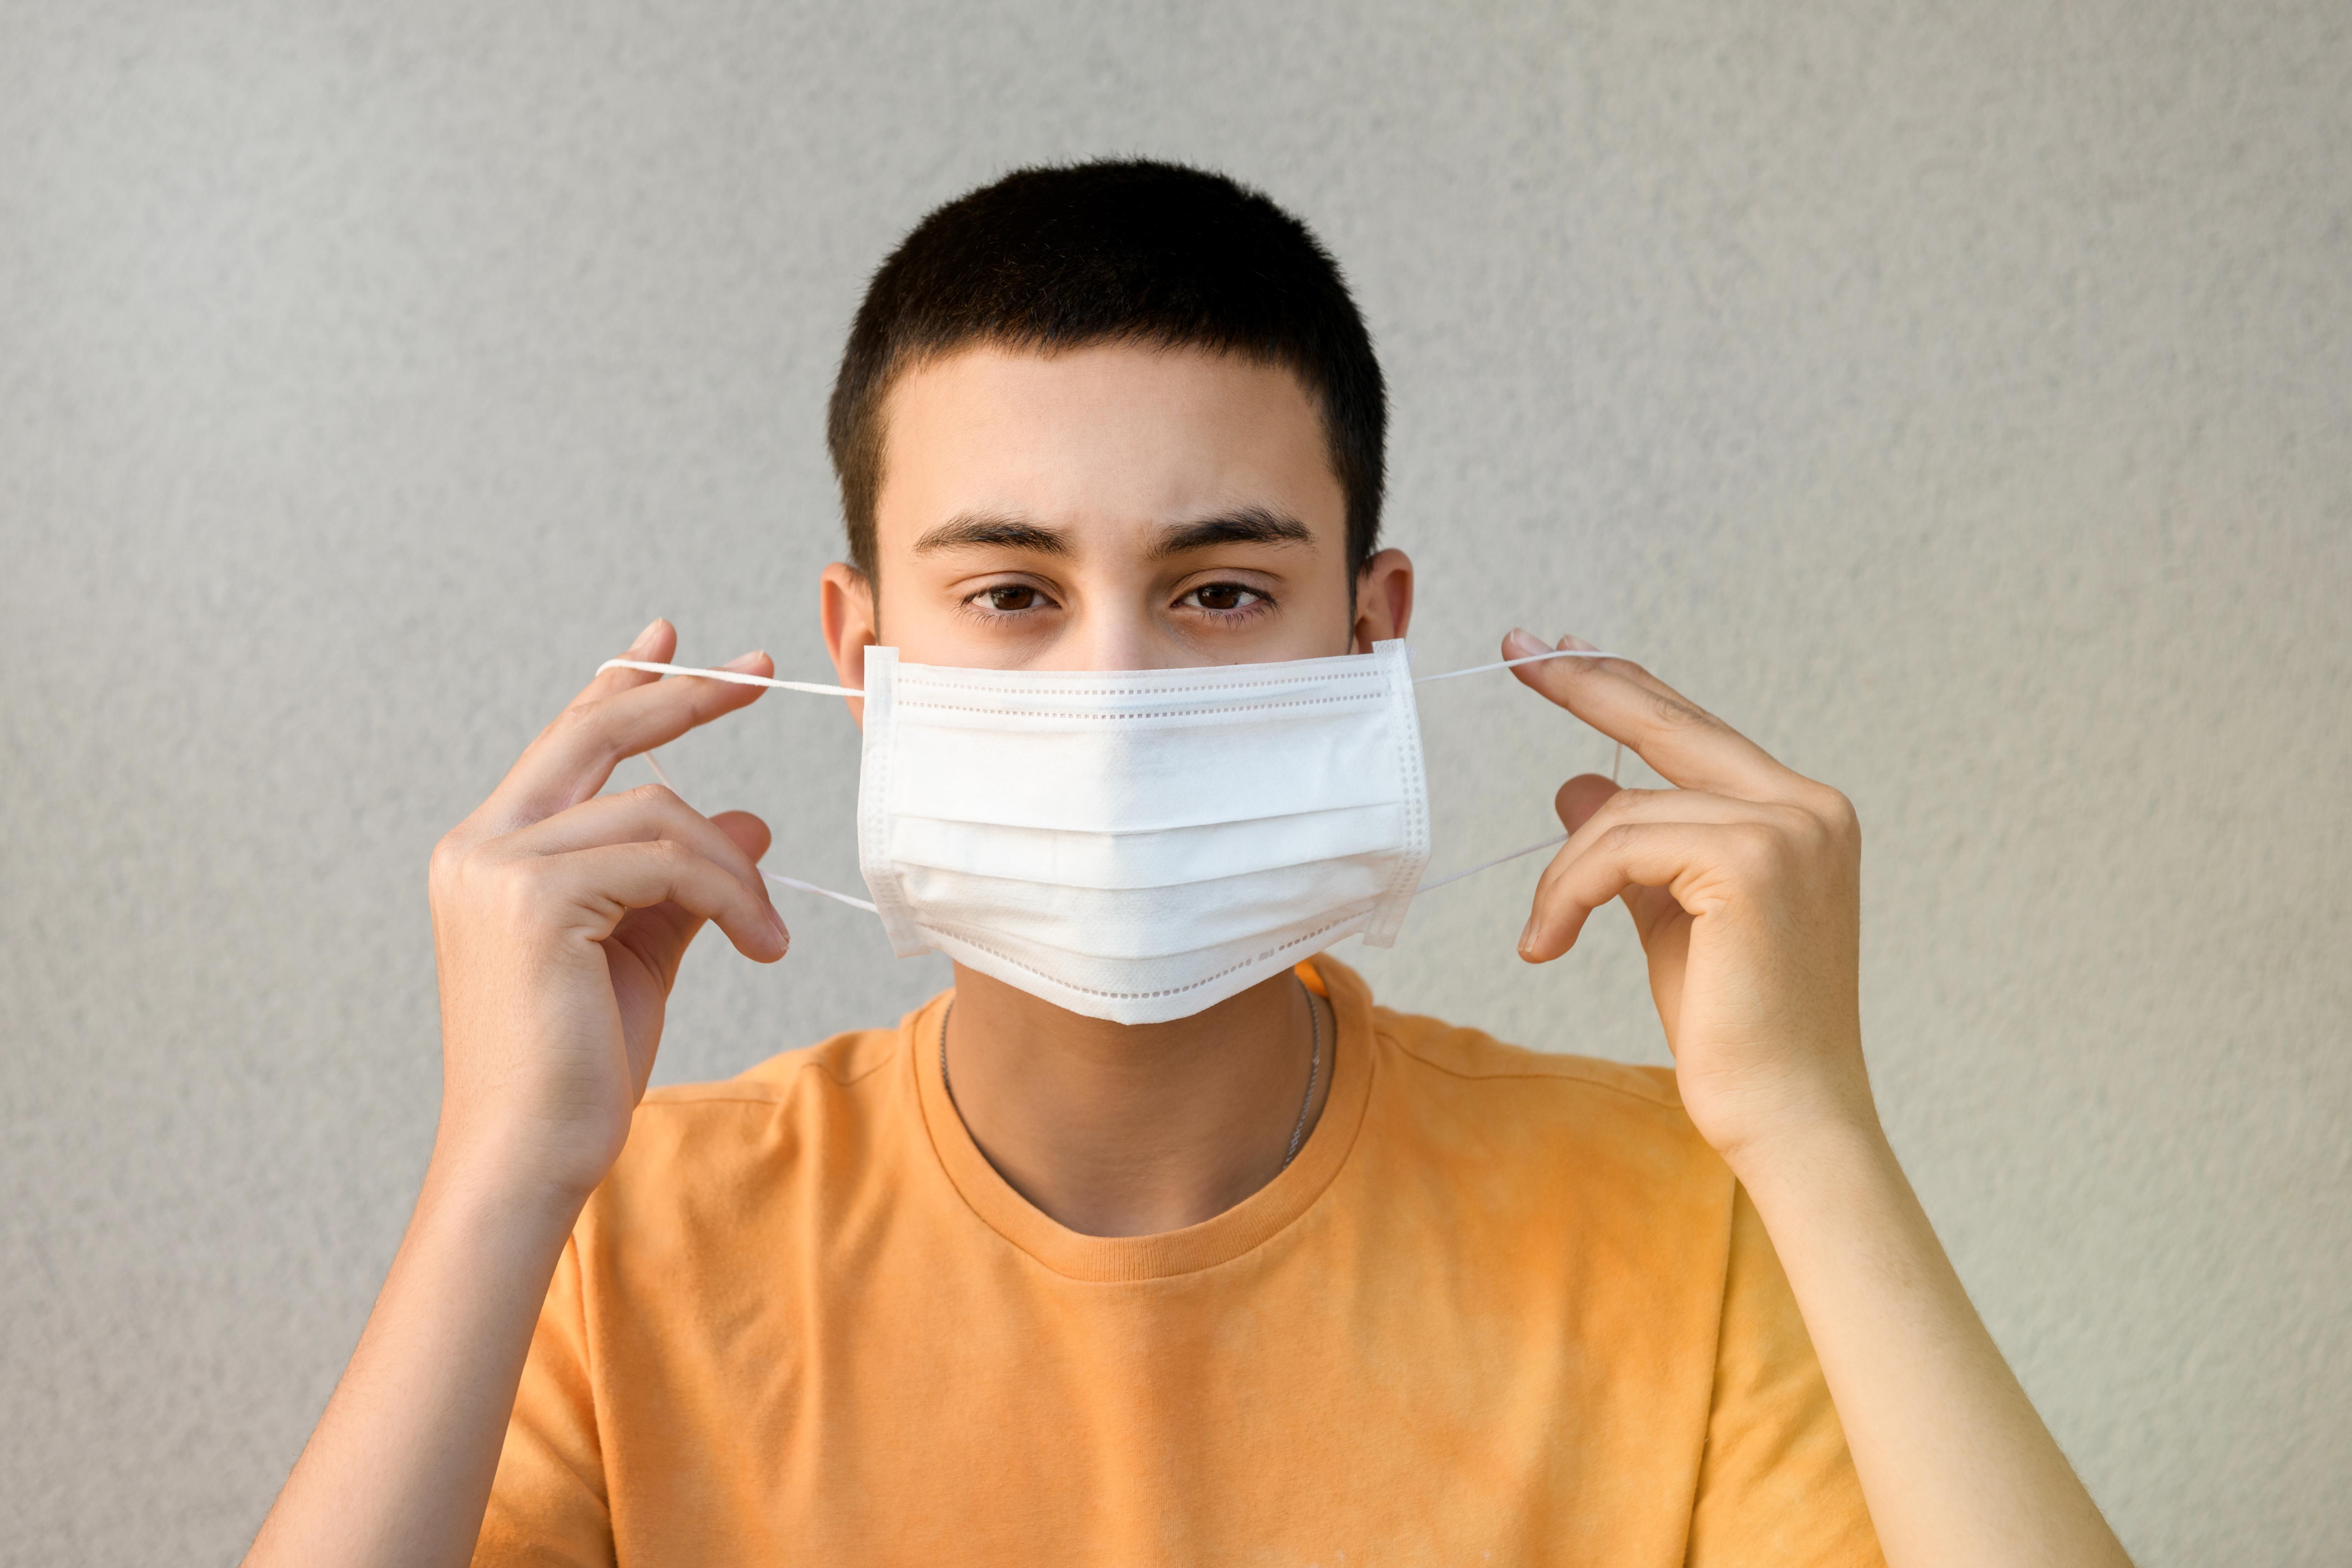 teenage-boy-holding-up-a-face-mask-GL762YQ